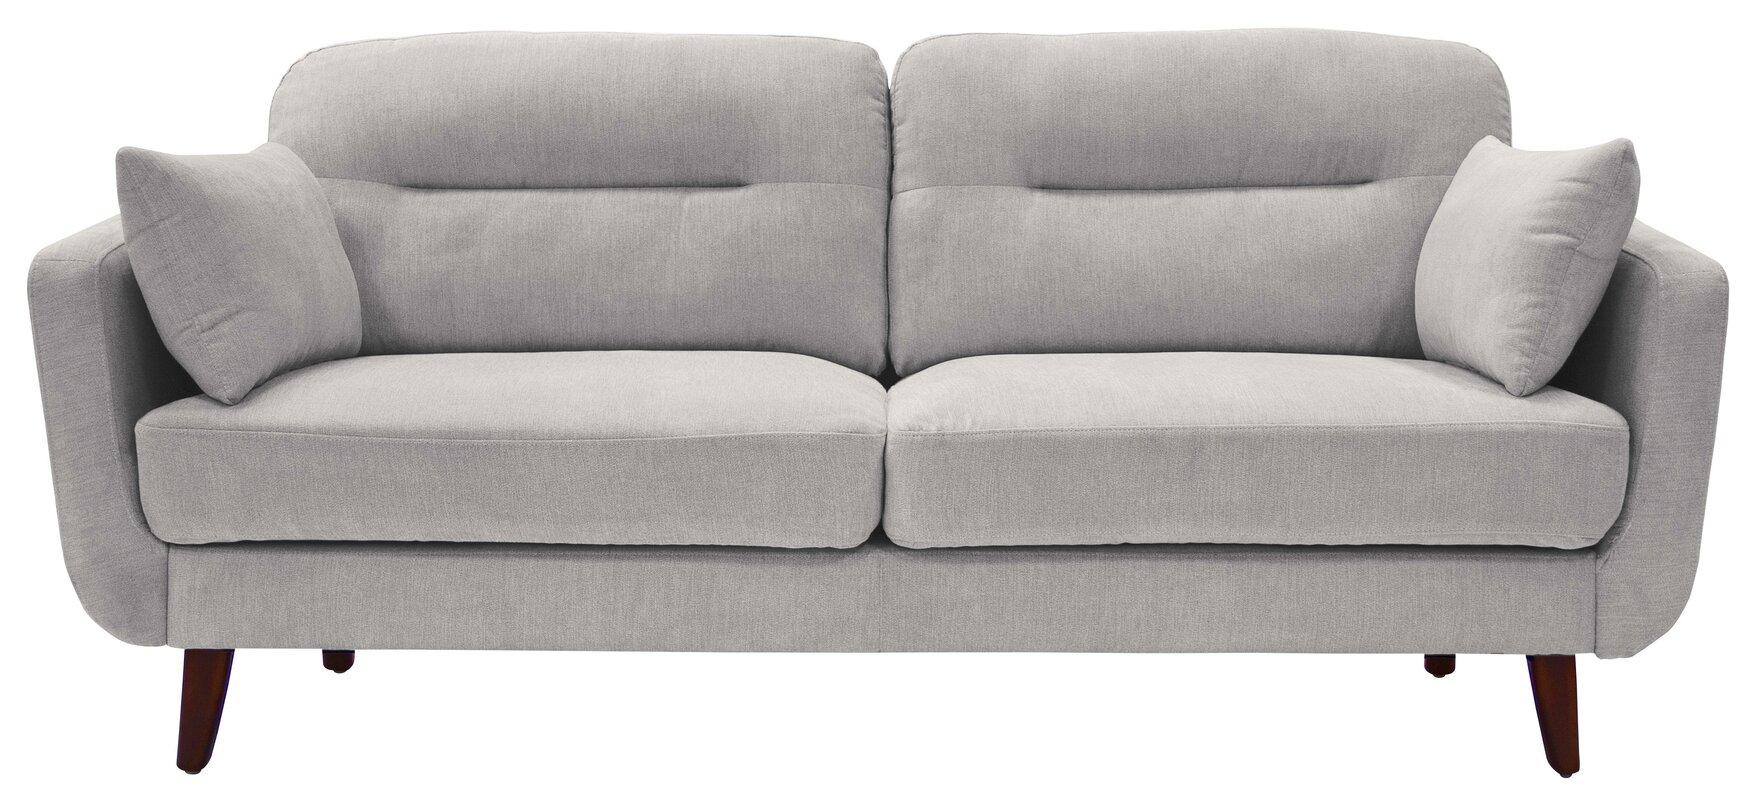 Unique Affordable Mid Century Modern Sofas 33 With Additional  ~ Affordable Mid Century Sofa